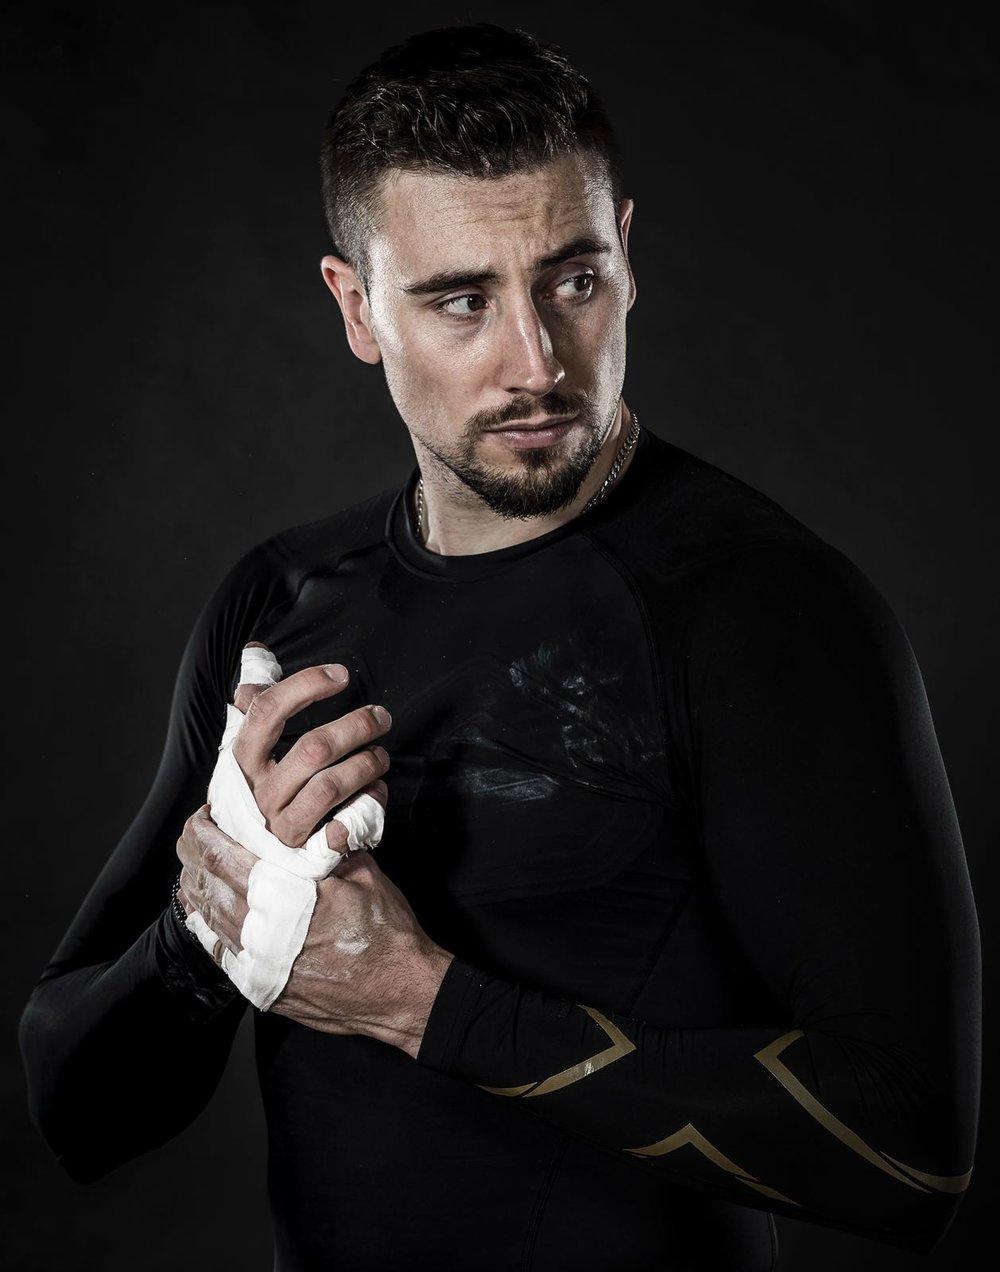 ALEXANDER KOPACZ - 2018 Olympic 2-man Champion, Team Canada Brakeman & Mechanical Engineer